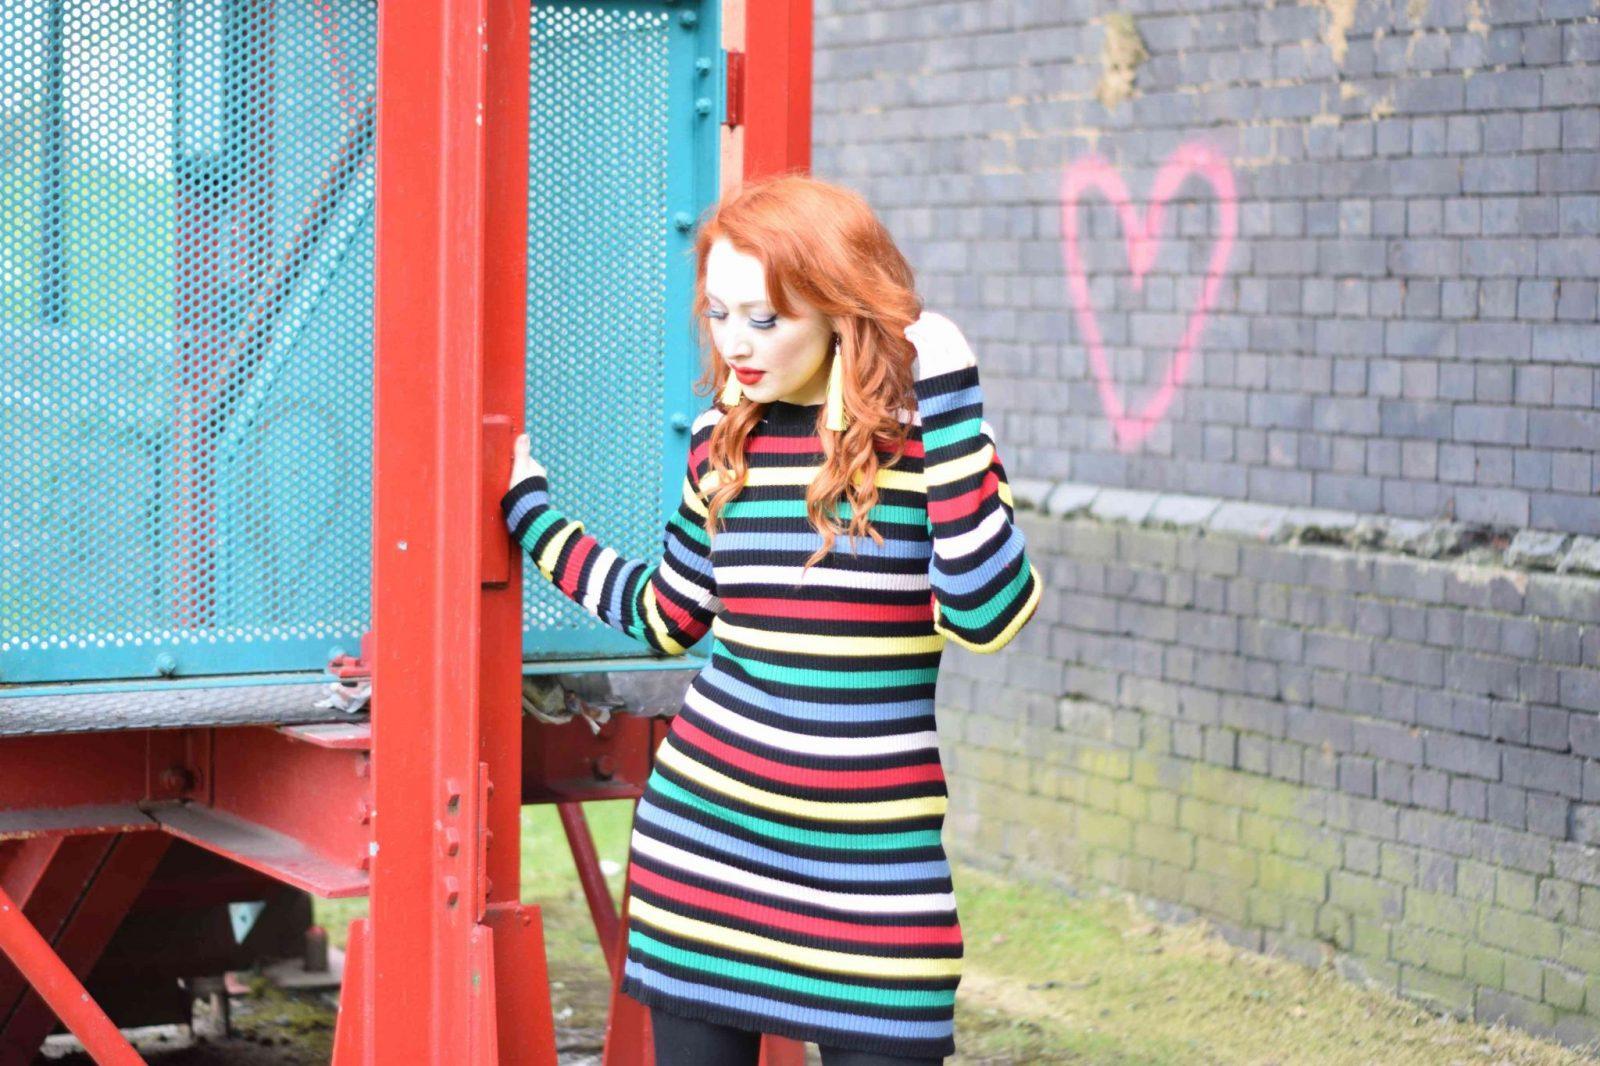 Blogger Twenty-Something City in a bright rainbow stripe dress